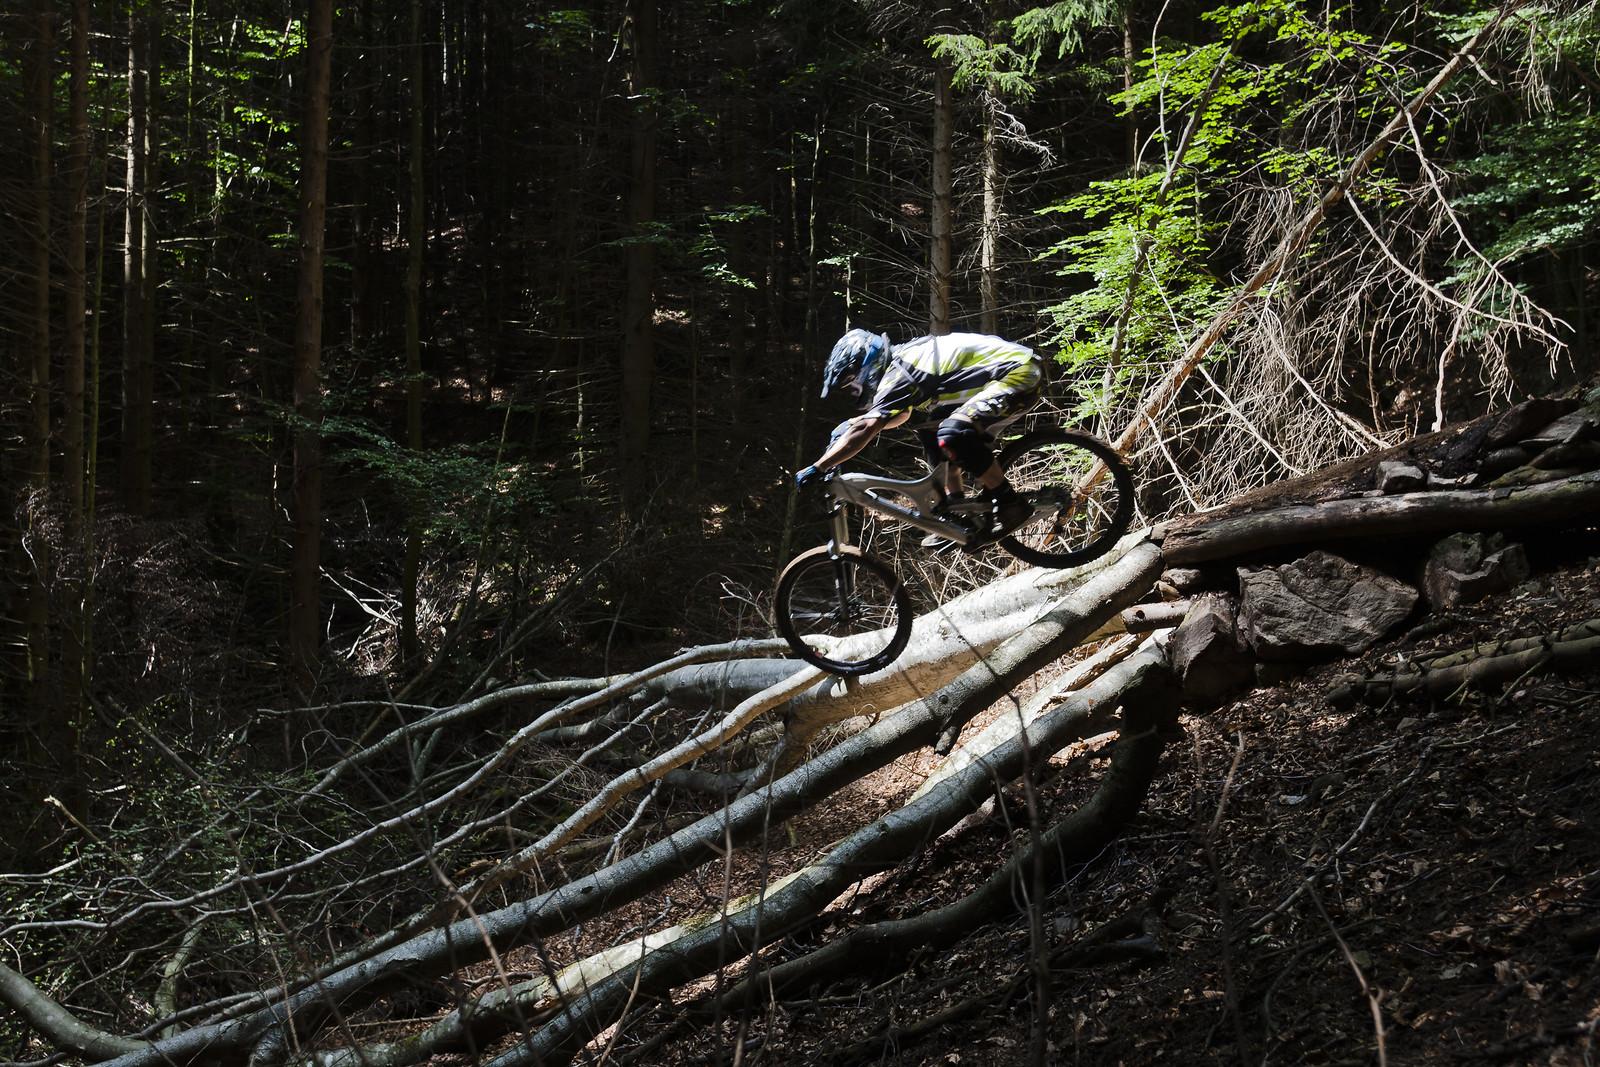 Black Forest Secret Spot - quasibinaer - Mountain Biking Pictures - Vital MTB